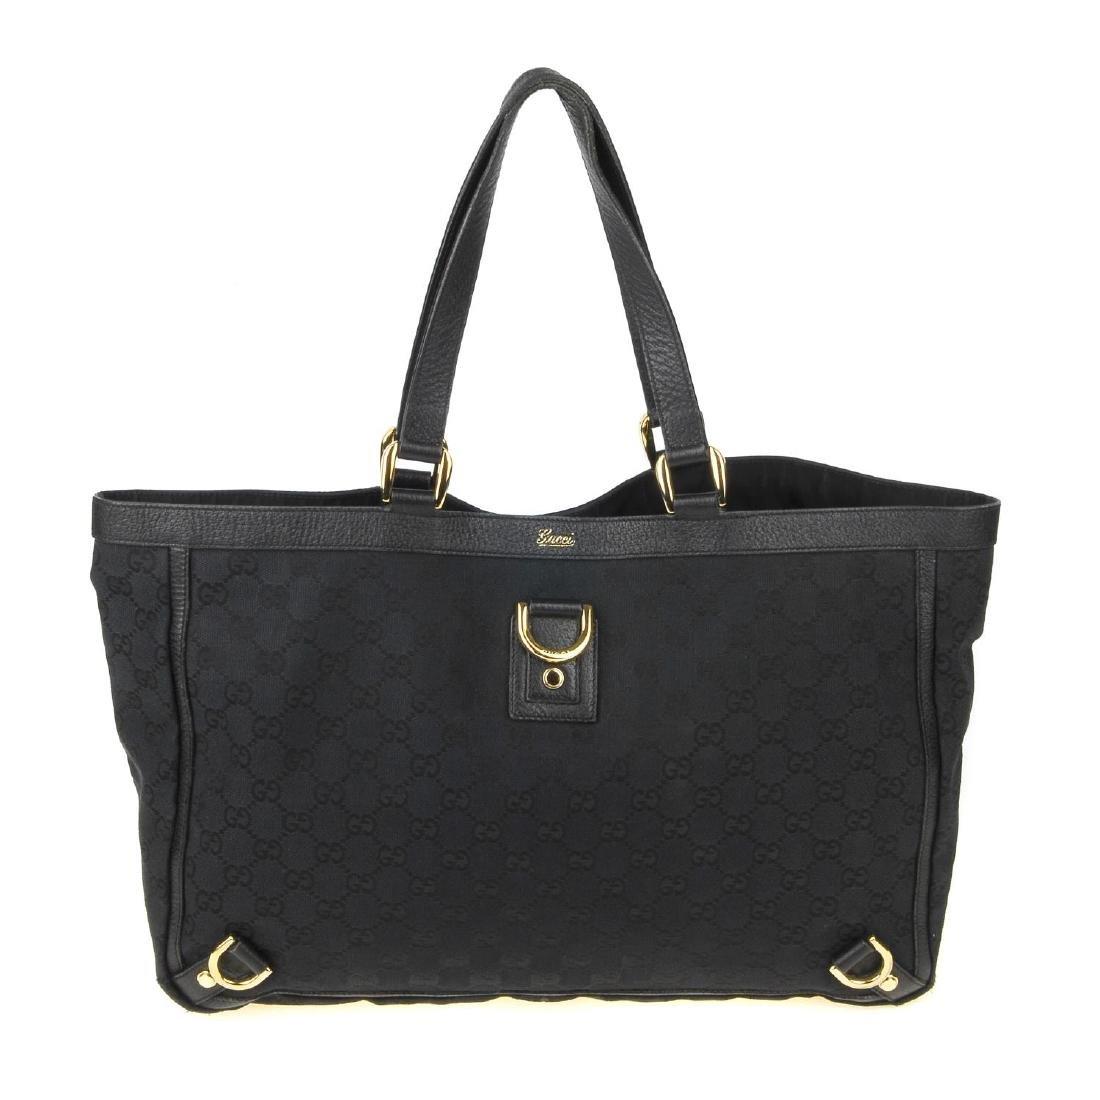 GUCCI - a black Abbey handbag. Crafted from black